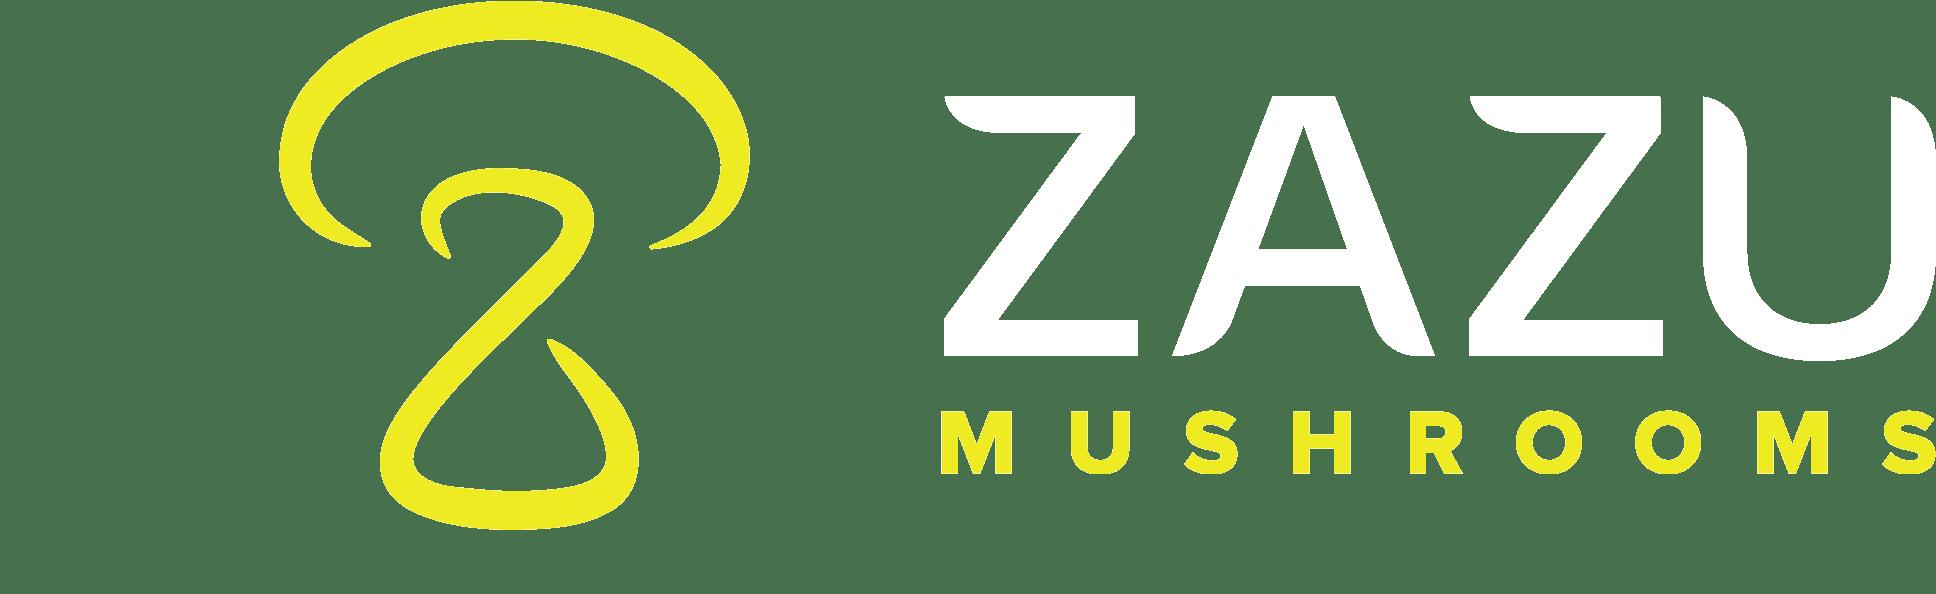 ZAZU Mushroom